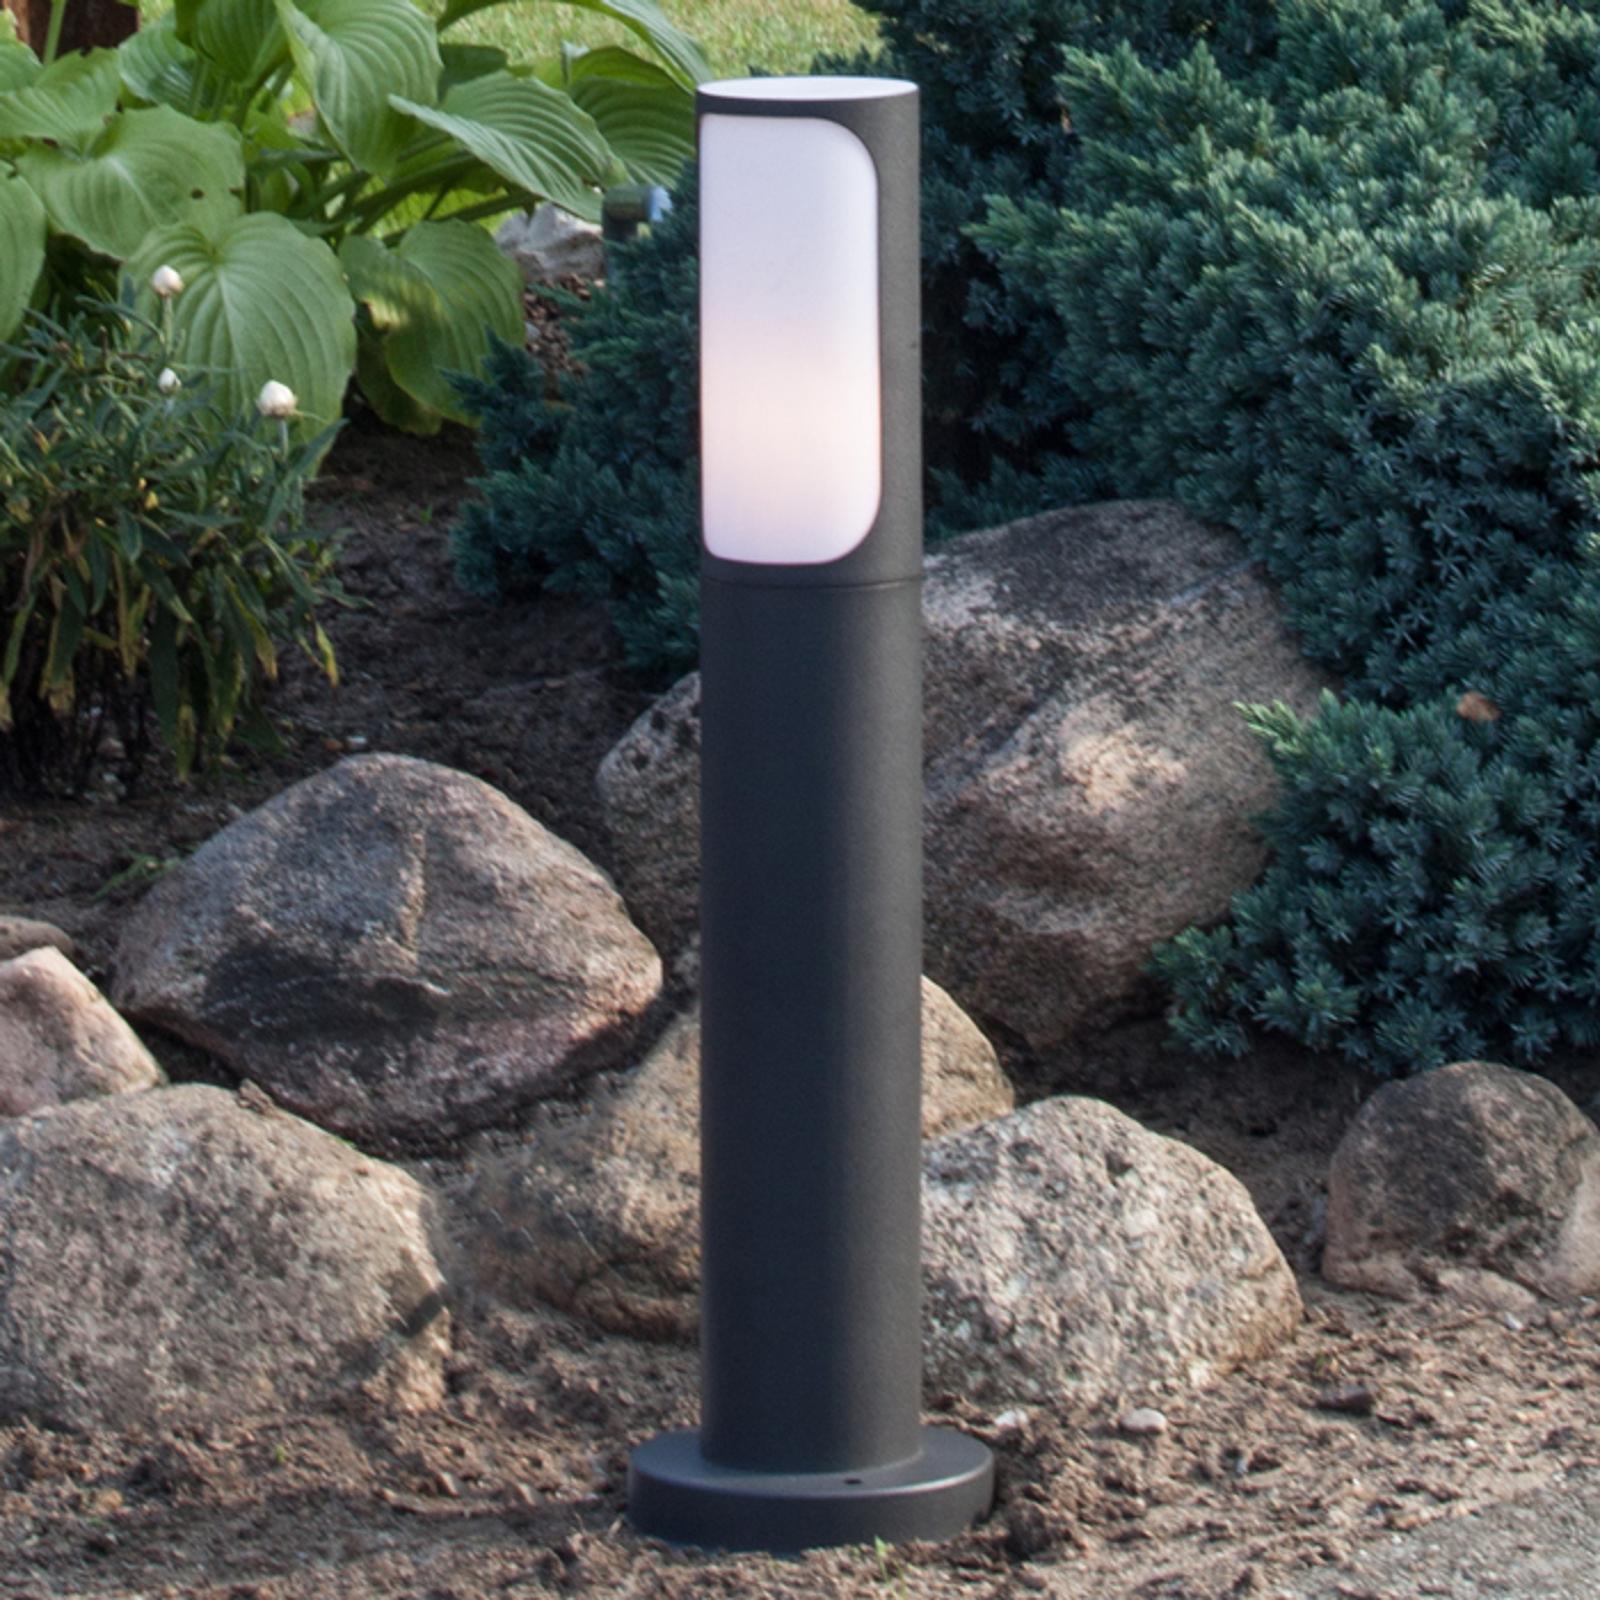 Energeticky úsporné soklové svietidlo Gap_1507239_1